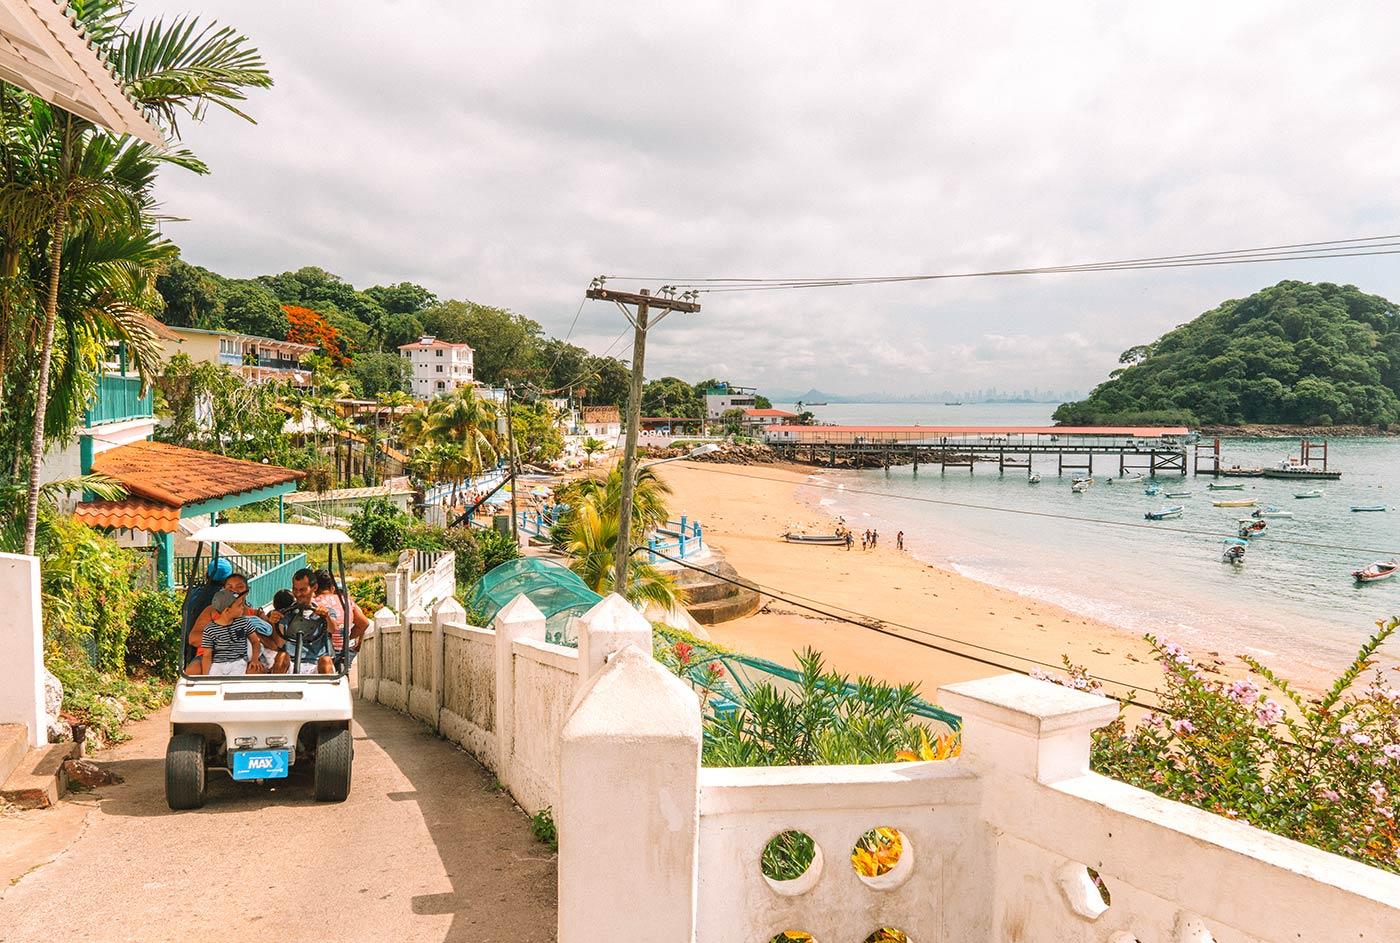 A guide to Taboga Island in Panama City